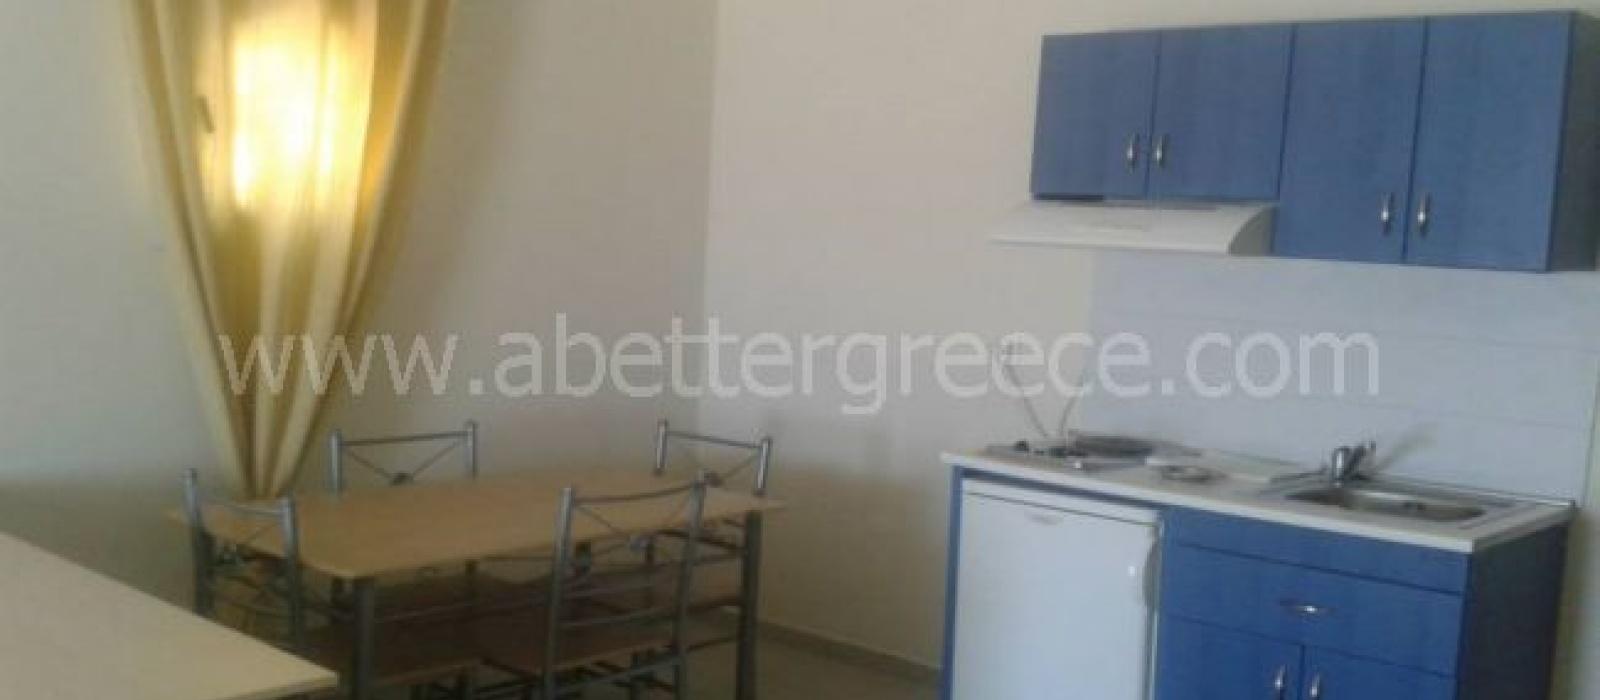 1 Bedrooms, Apartment, Vacation Rental, 1 Bathrooms, Listing ID 1168, Iraklia, Greece,